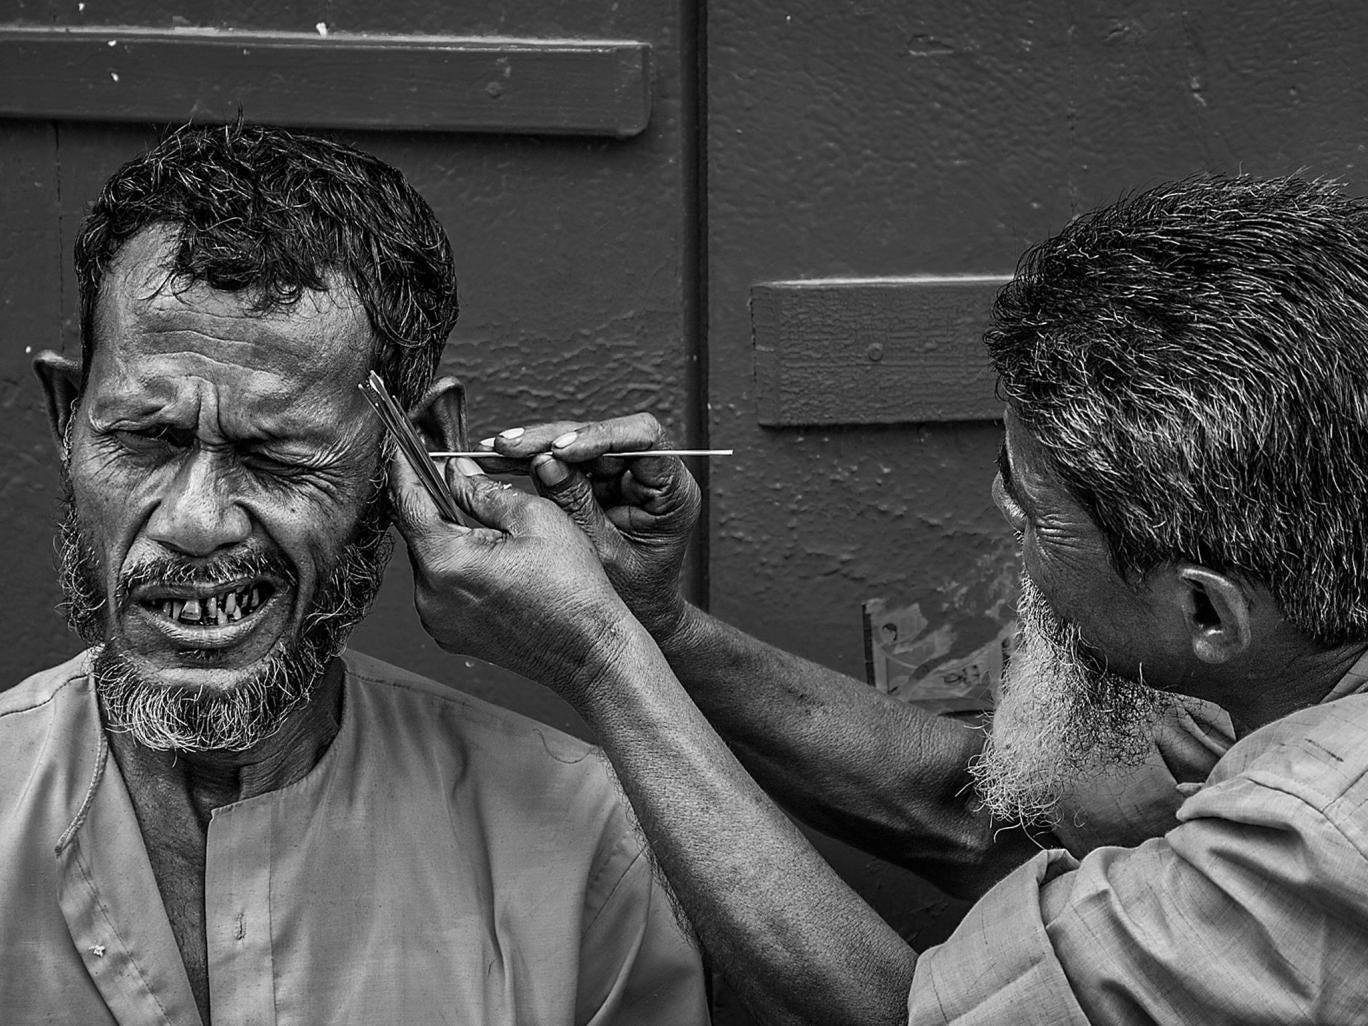 3. Winner: People category. Careful, brother... (Kolkata, India) by Sandipan Mukherjee